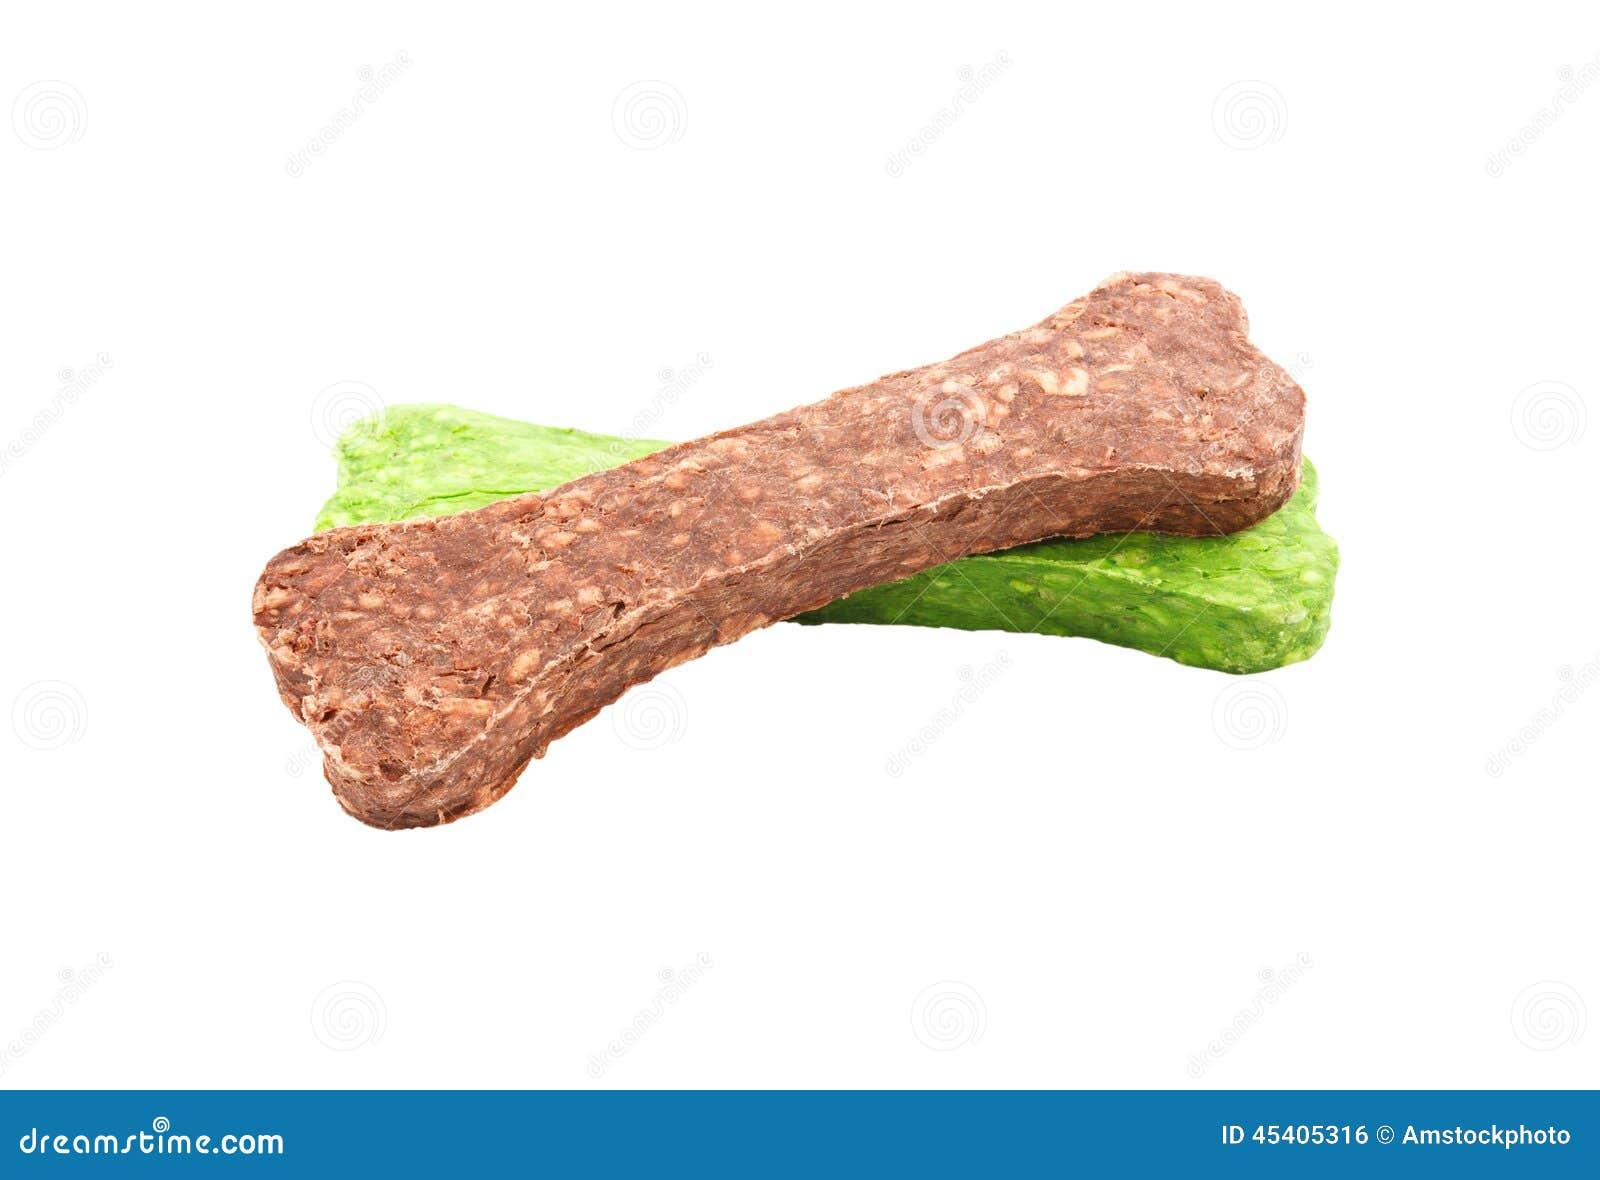 Brown dog bone background - photo#16